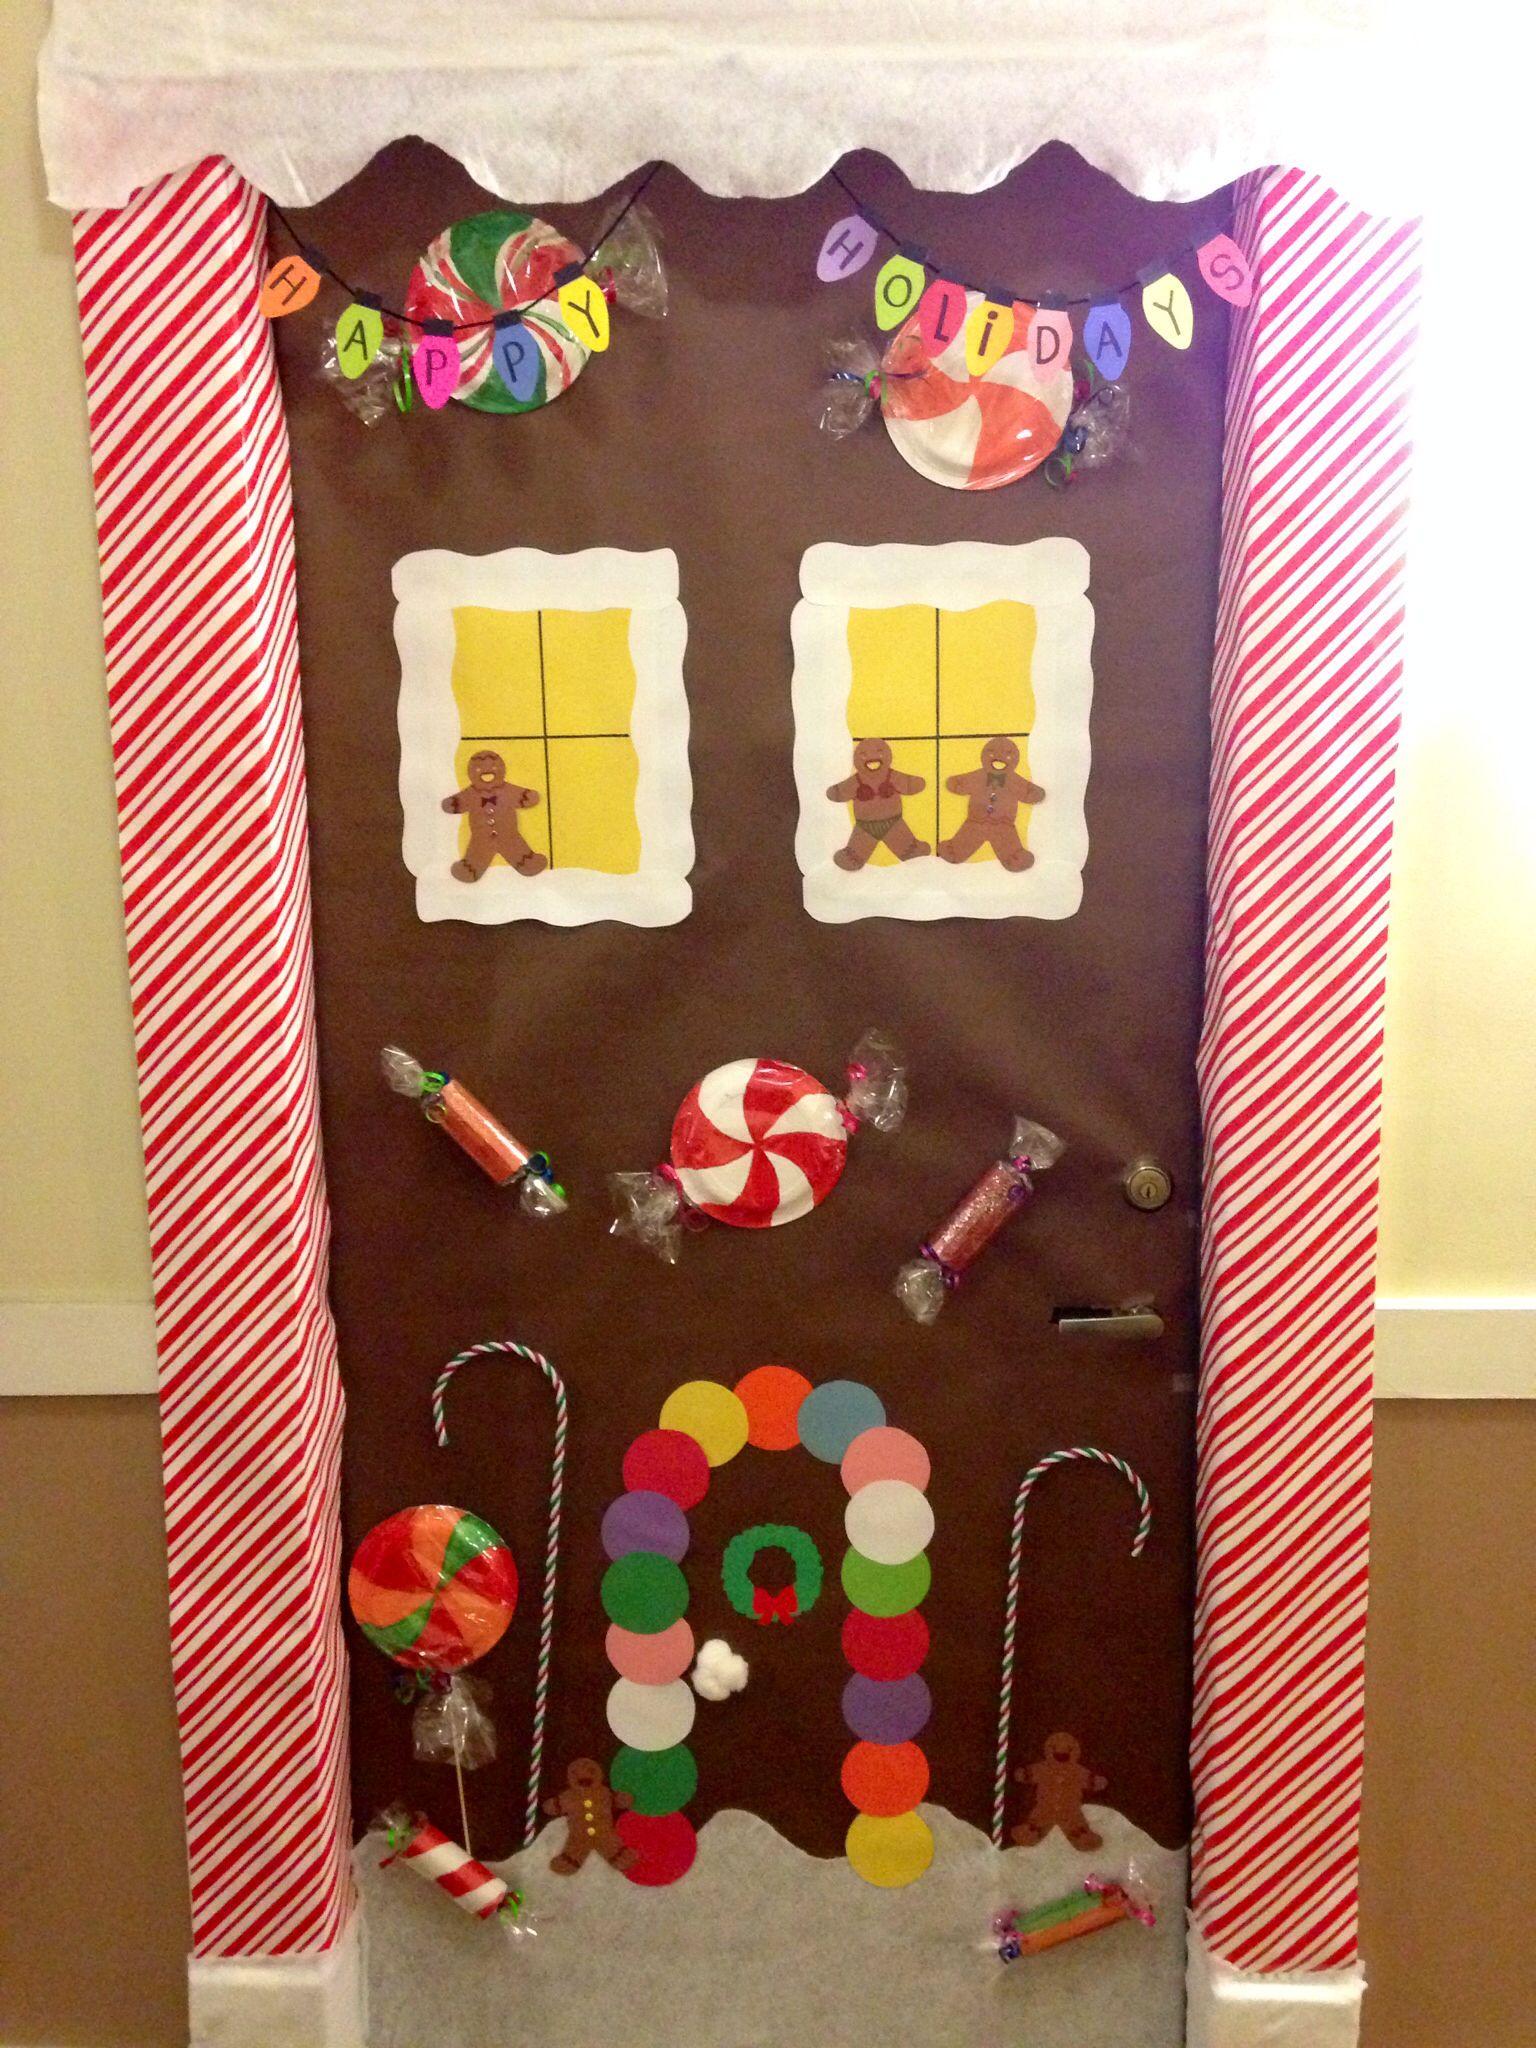 Gingerbread house door decorations for christmas ciupa for Gingerbread decorations